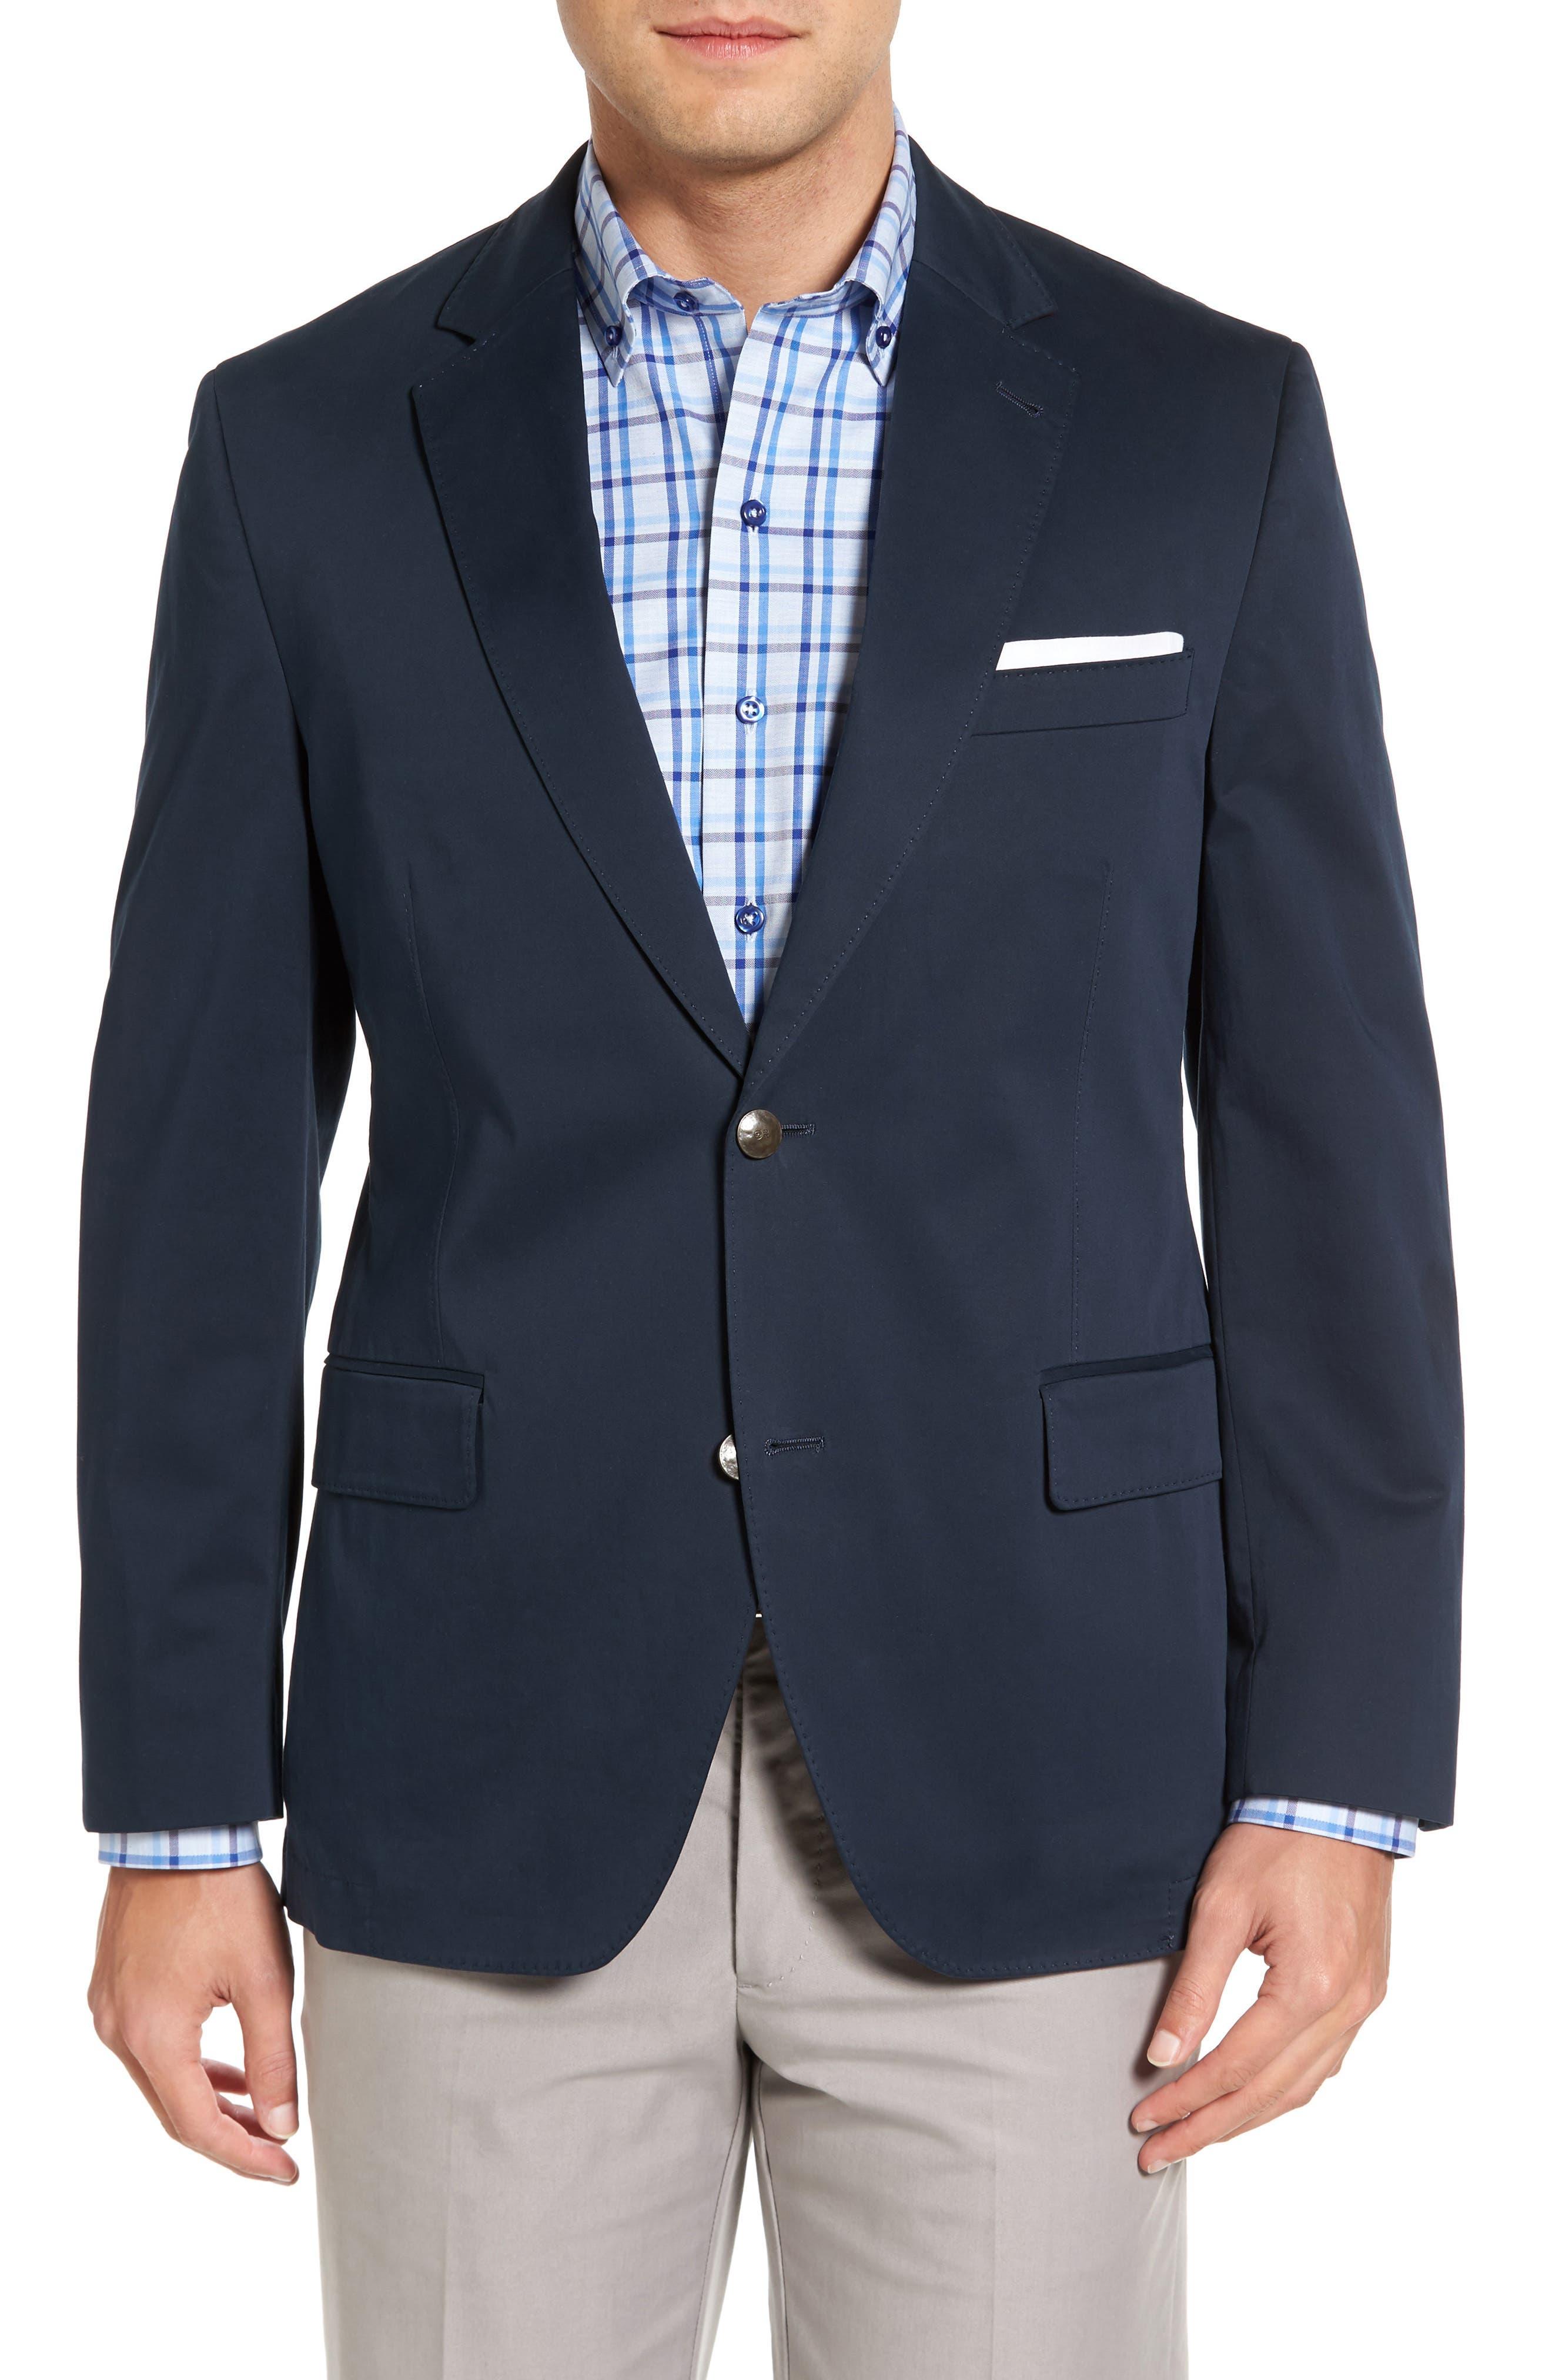 Main Image - Kroon Mathis Classic Fit Stretch Cotton Blazer